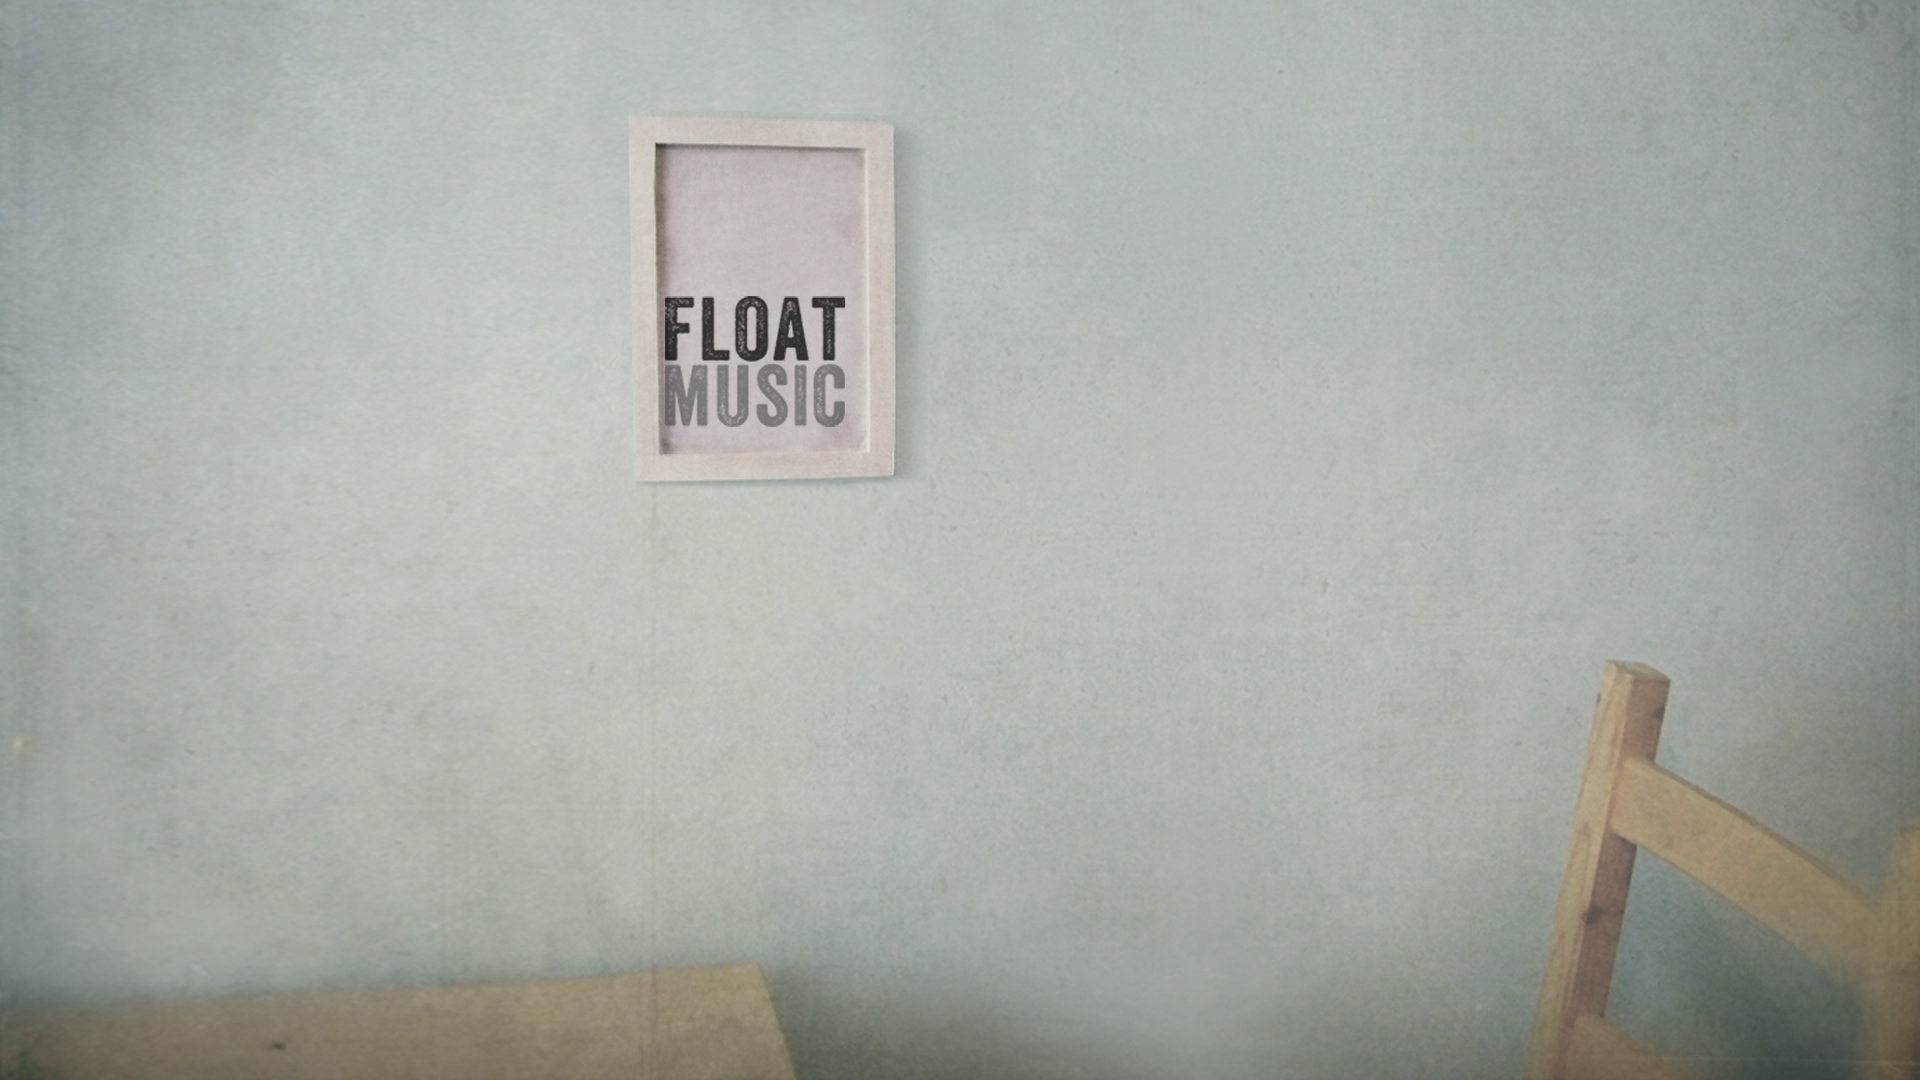 FLOAT MUSIC